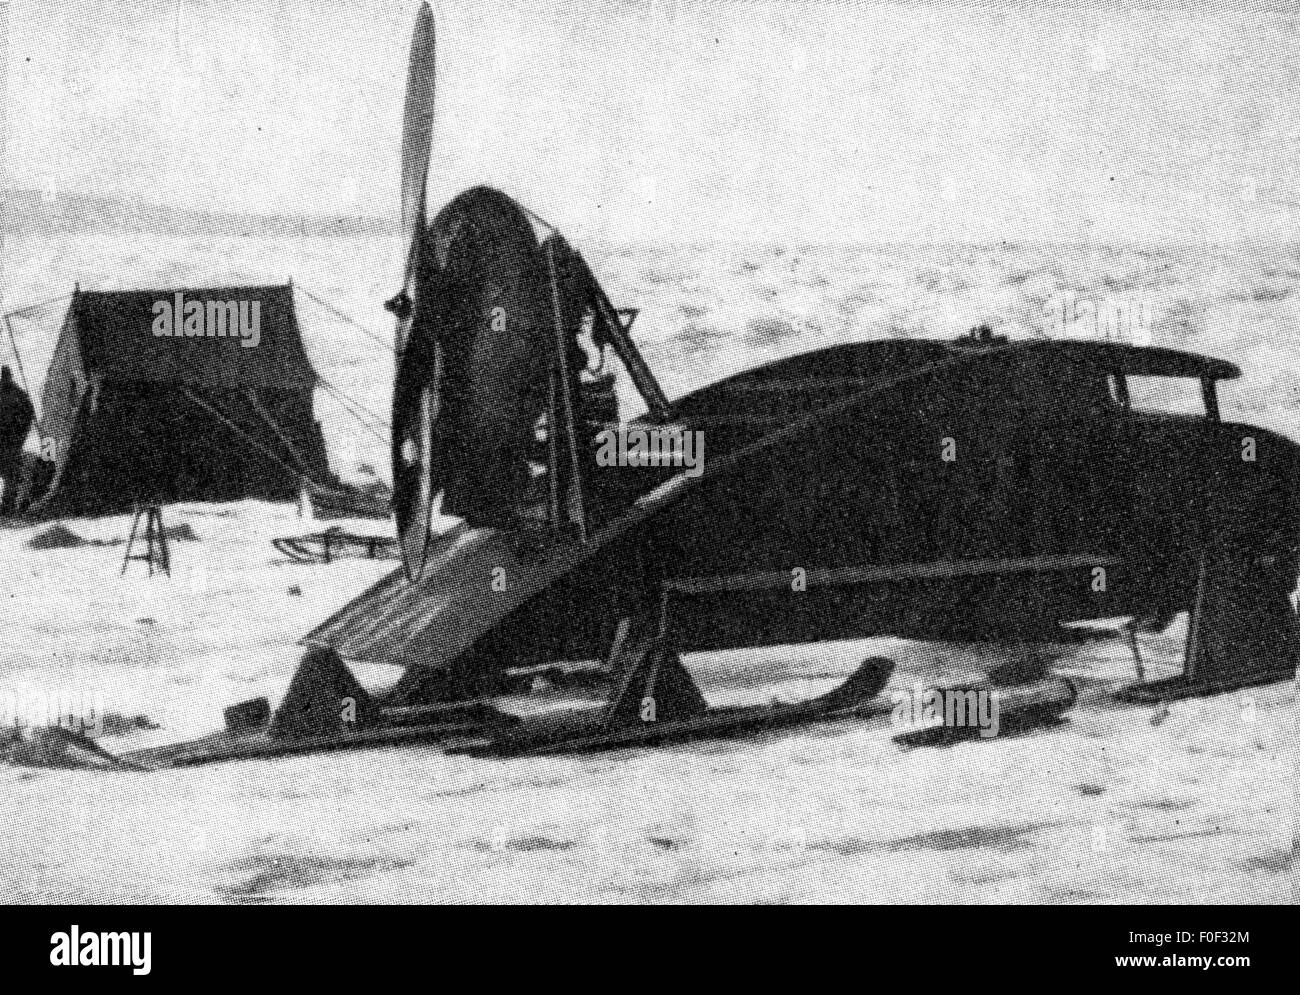 Wegener, Alfred Lothar, 1.11.1880 - November 1930, German geophysicist, meteorologist, his propeller-driven sledge, - Stock Image